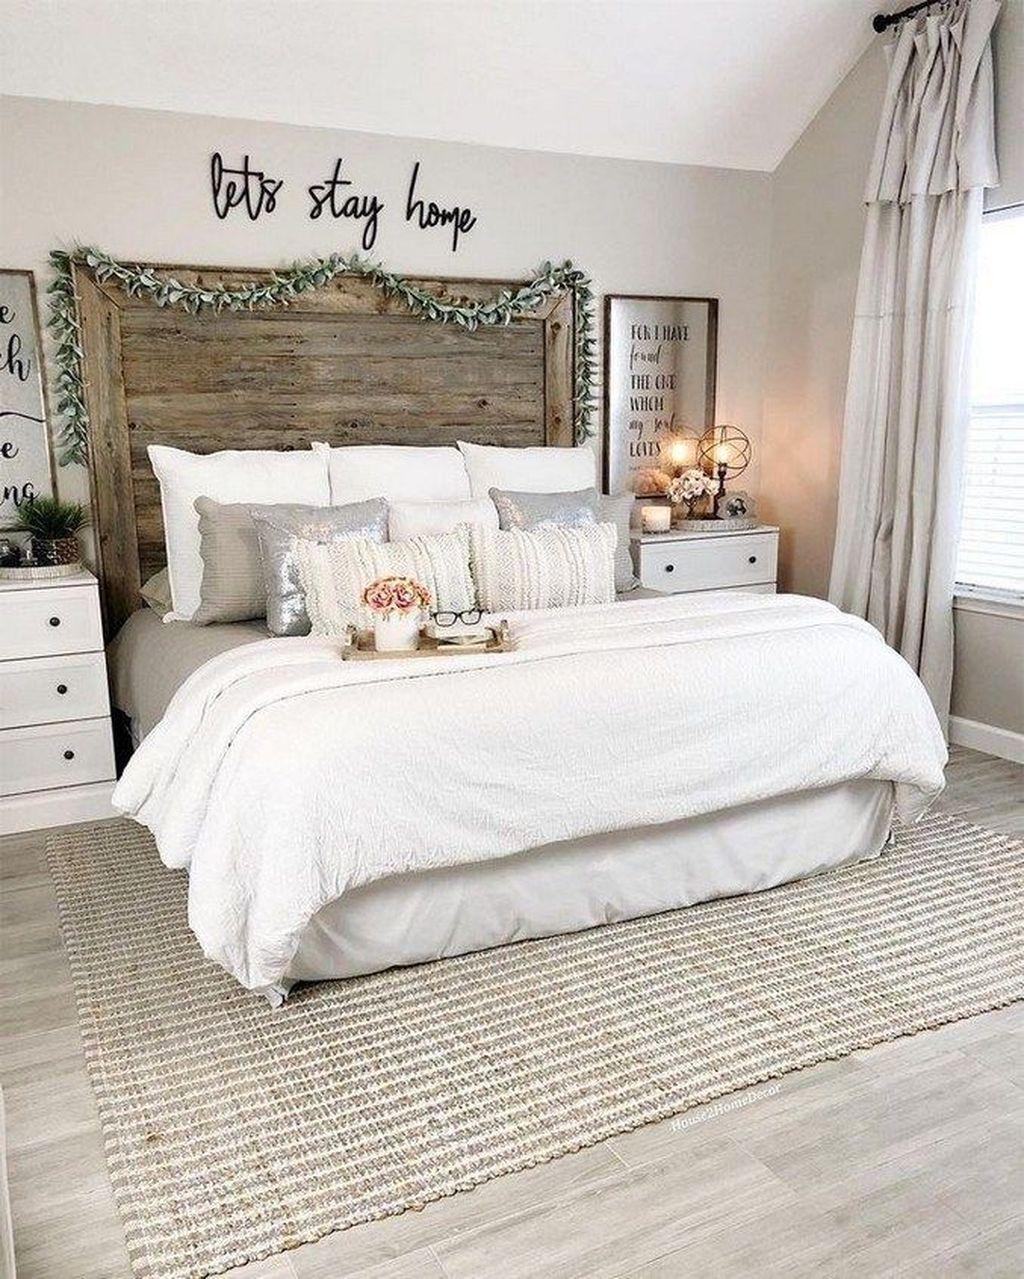 Amazing Farmhouse Style Master Bedroom Design And Decor Ideas Farmhouse Style Master Bedroom Small Master Bedroom Master Bedroom Makeover